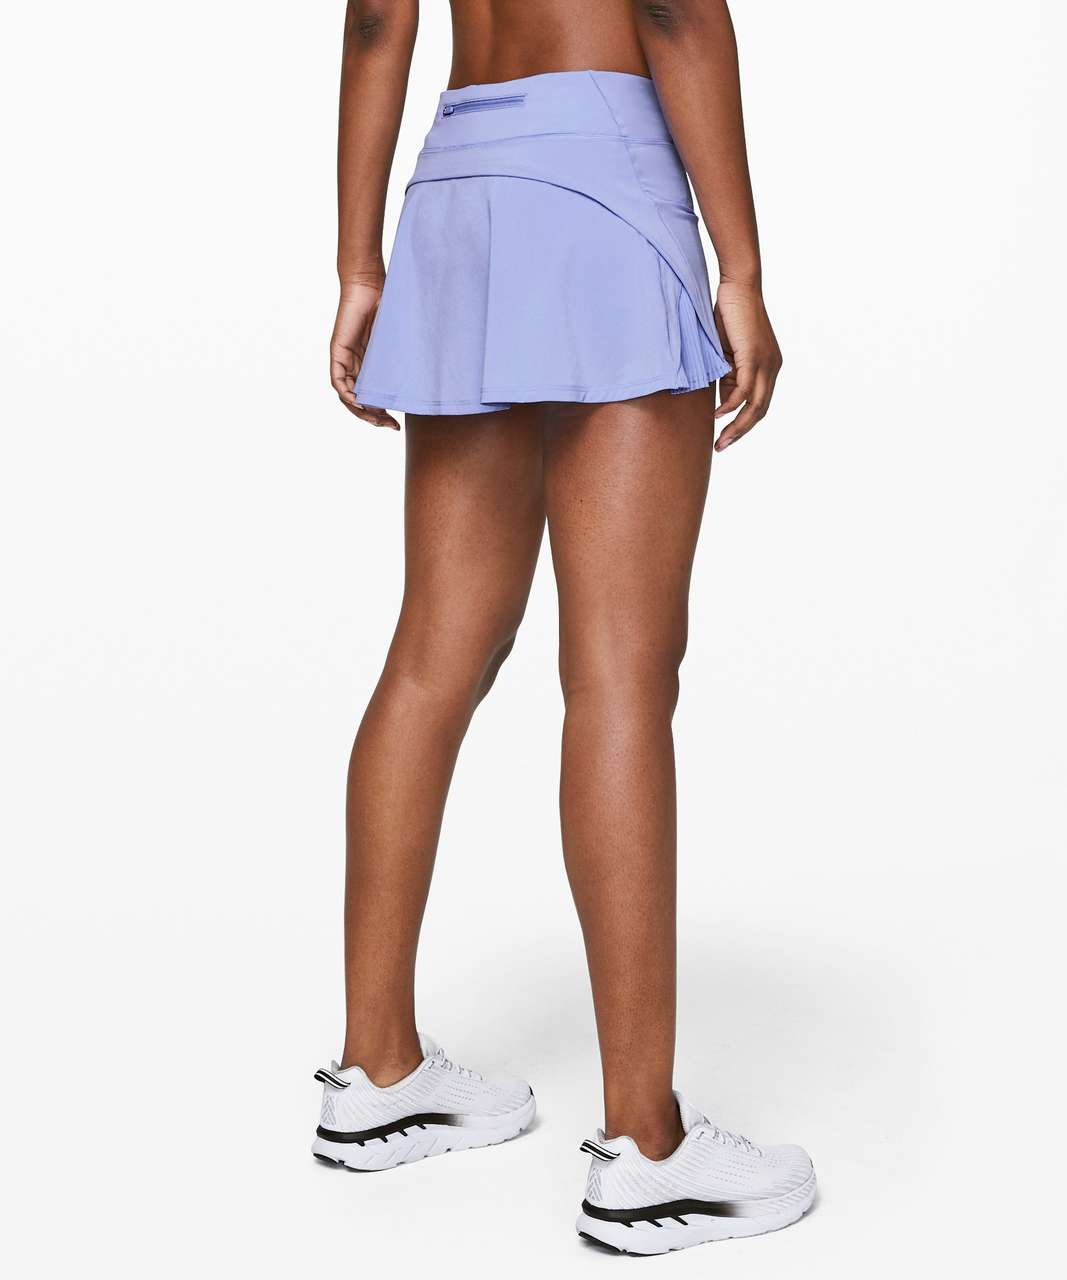 "Lululemon Play Off The Pleats Skirt *13"" - Hydrangea Blue"